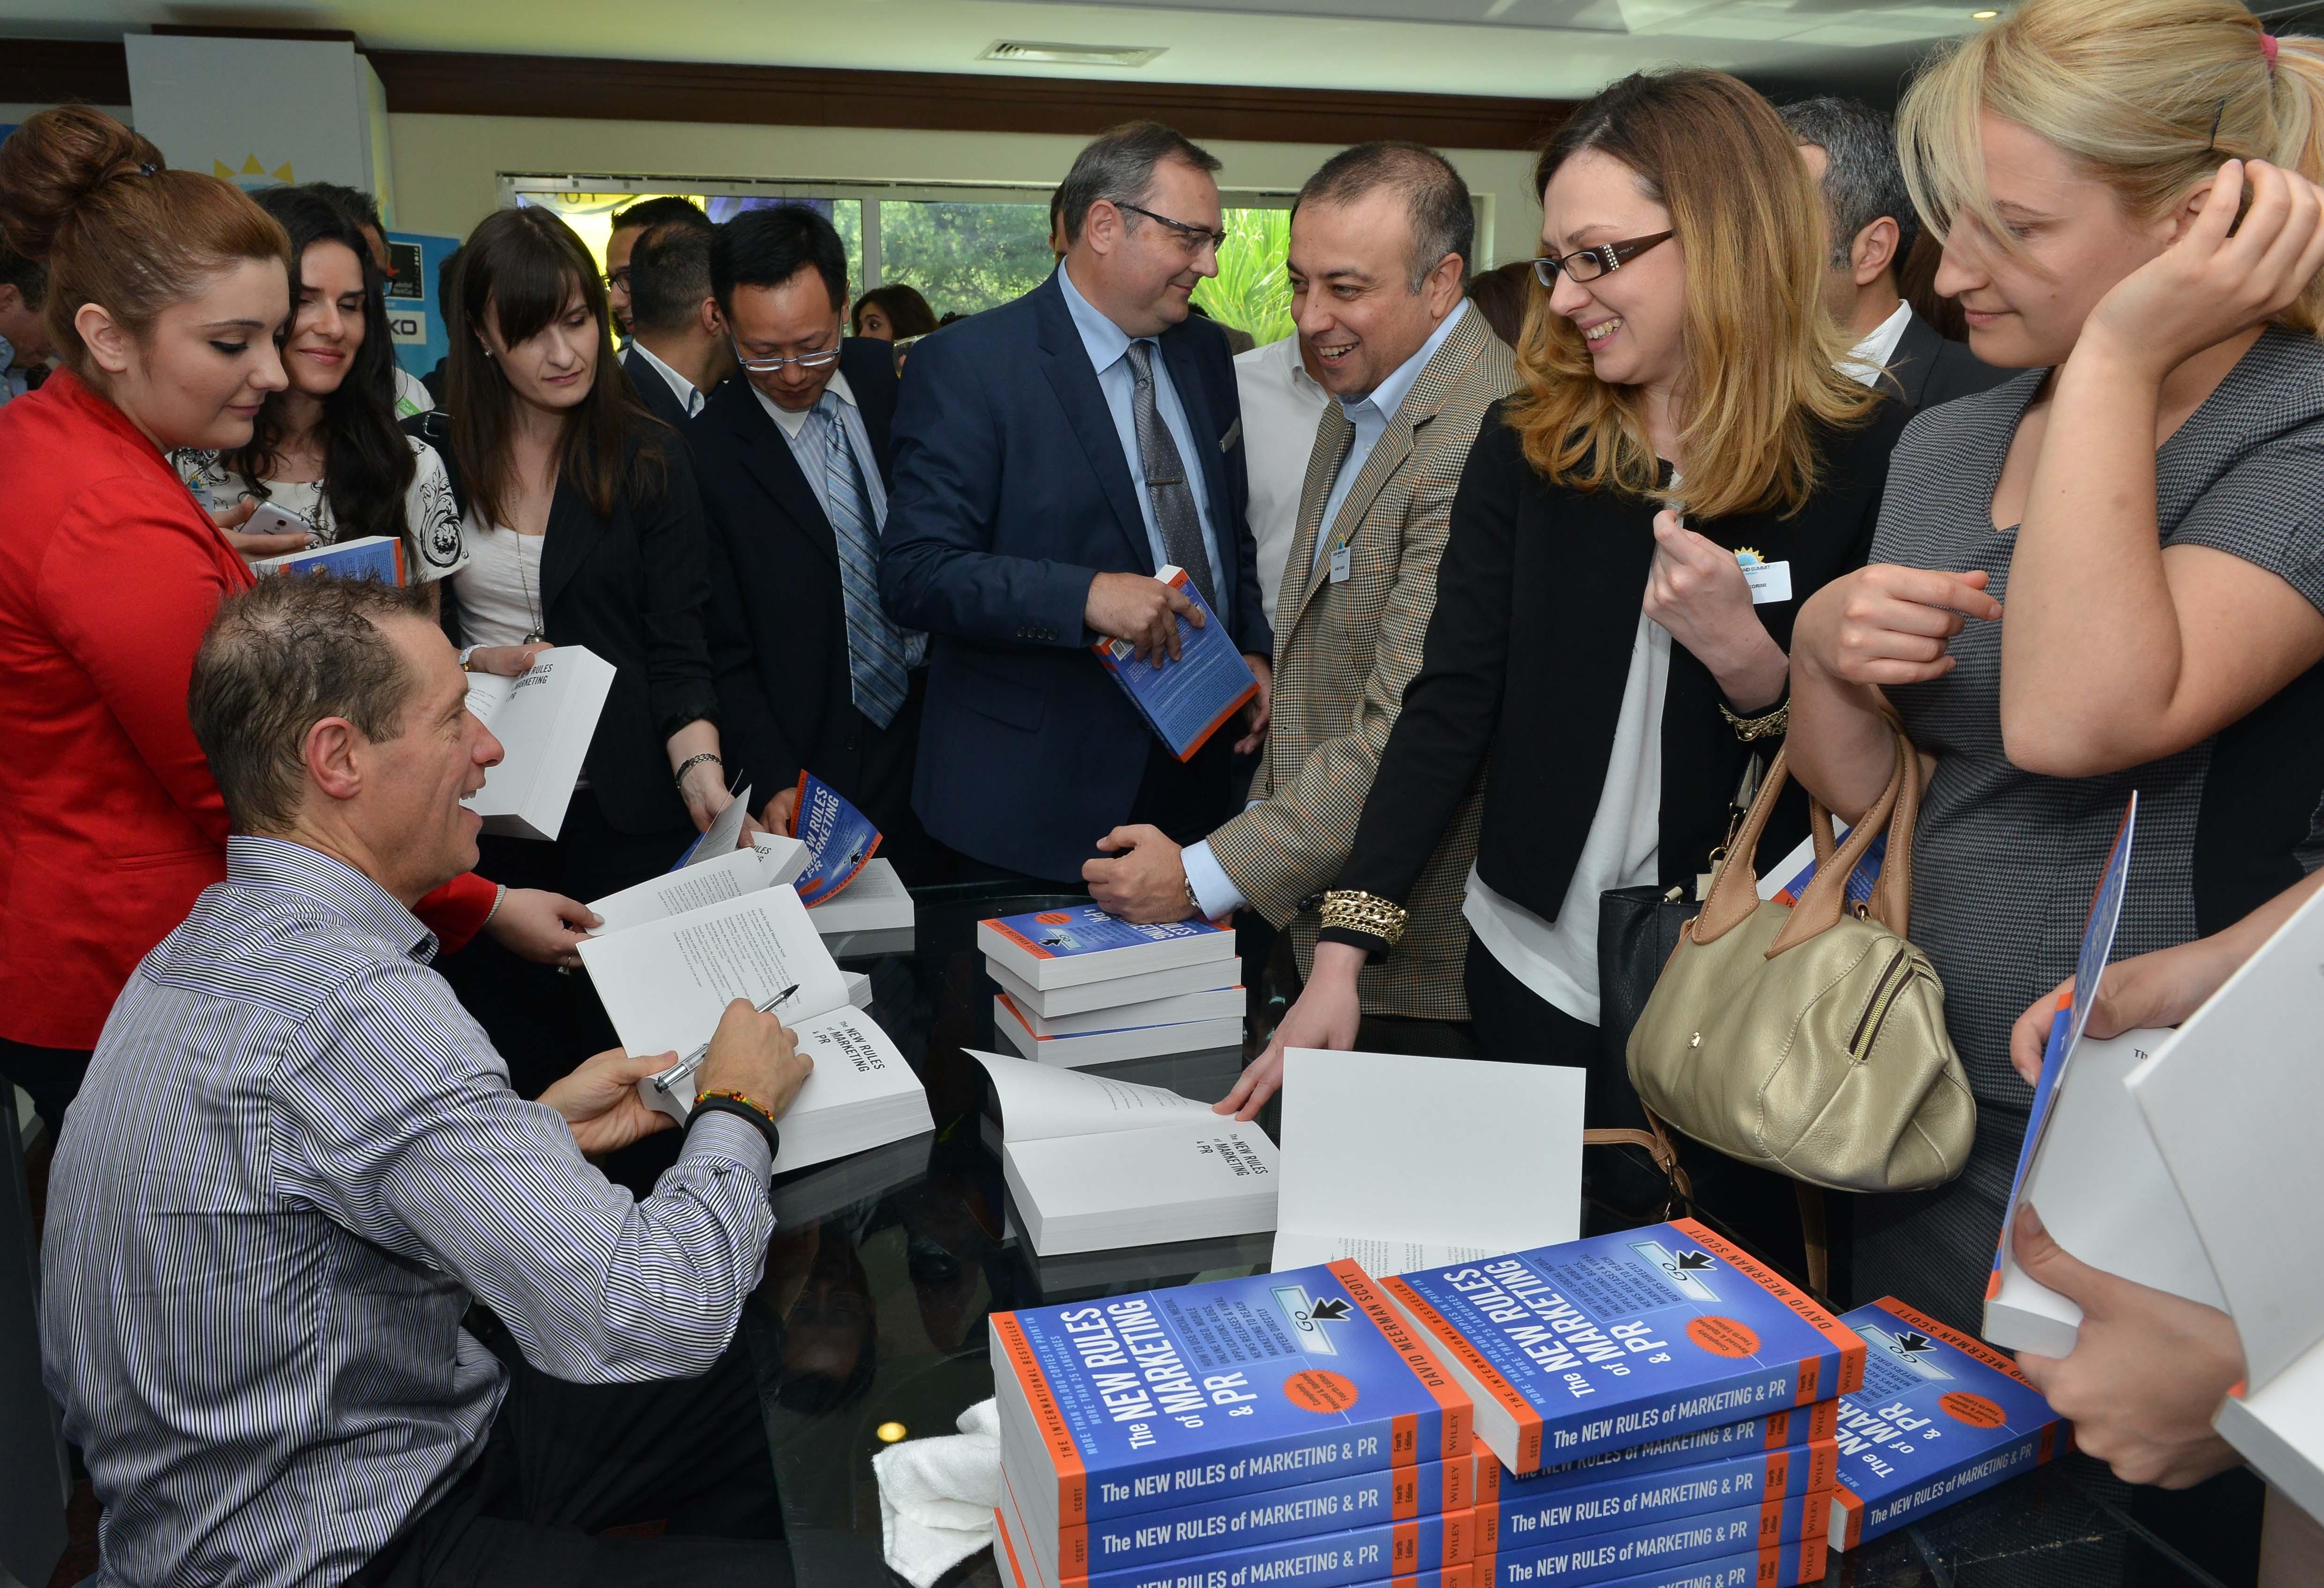 David Meerman Scott is an internationally acclaimed strategist,